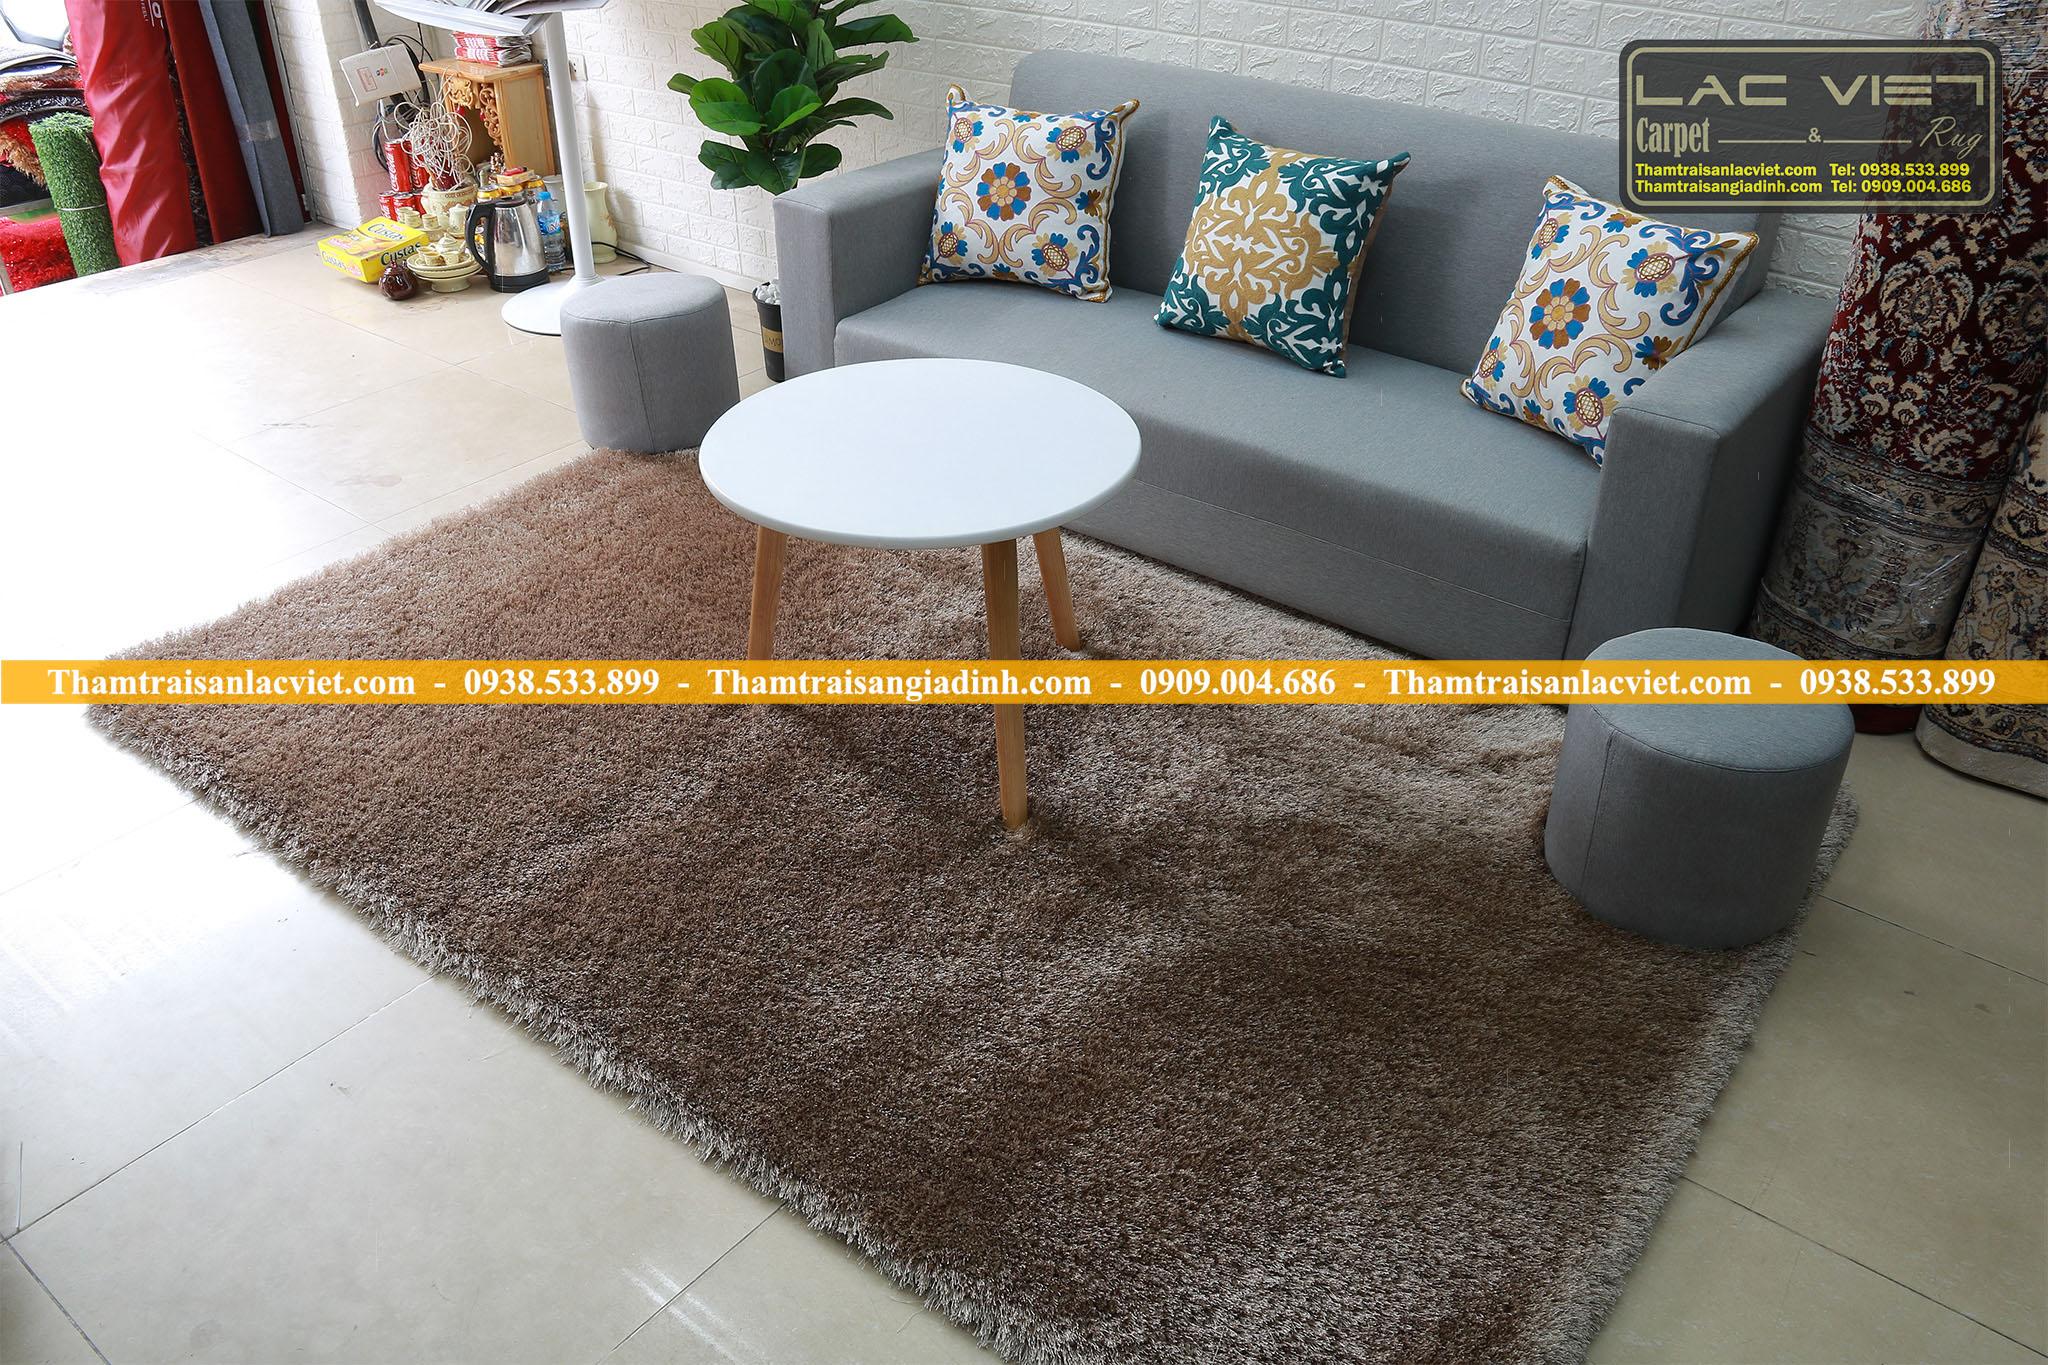 Thảm trải sàn Dubai-2792 CREAM BEIGE